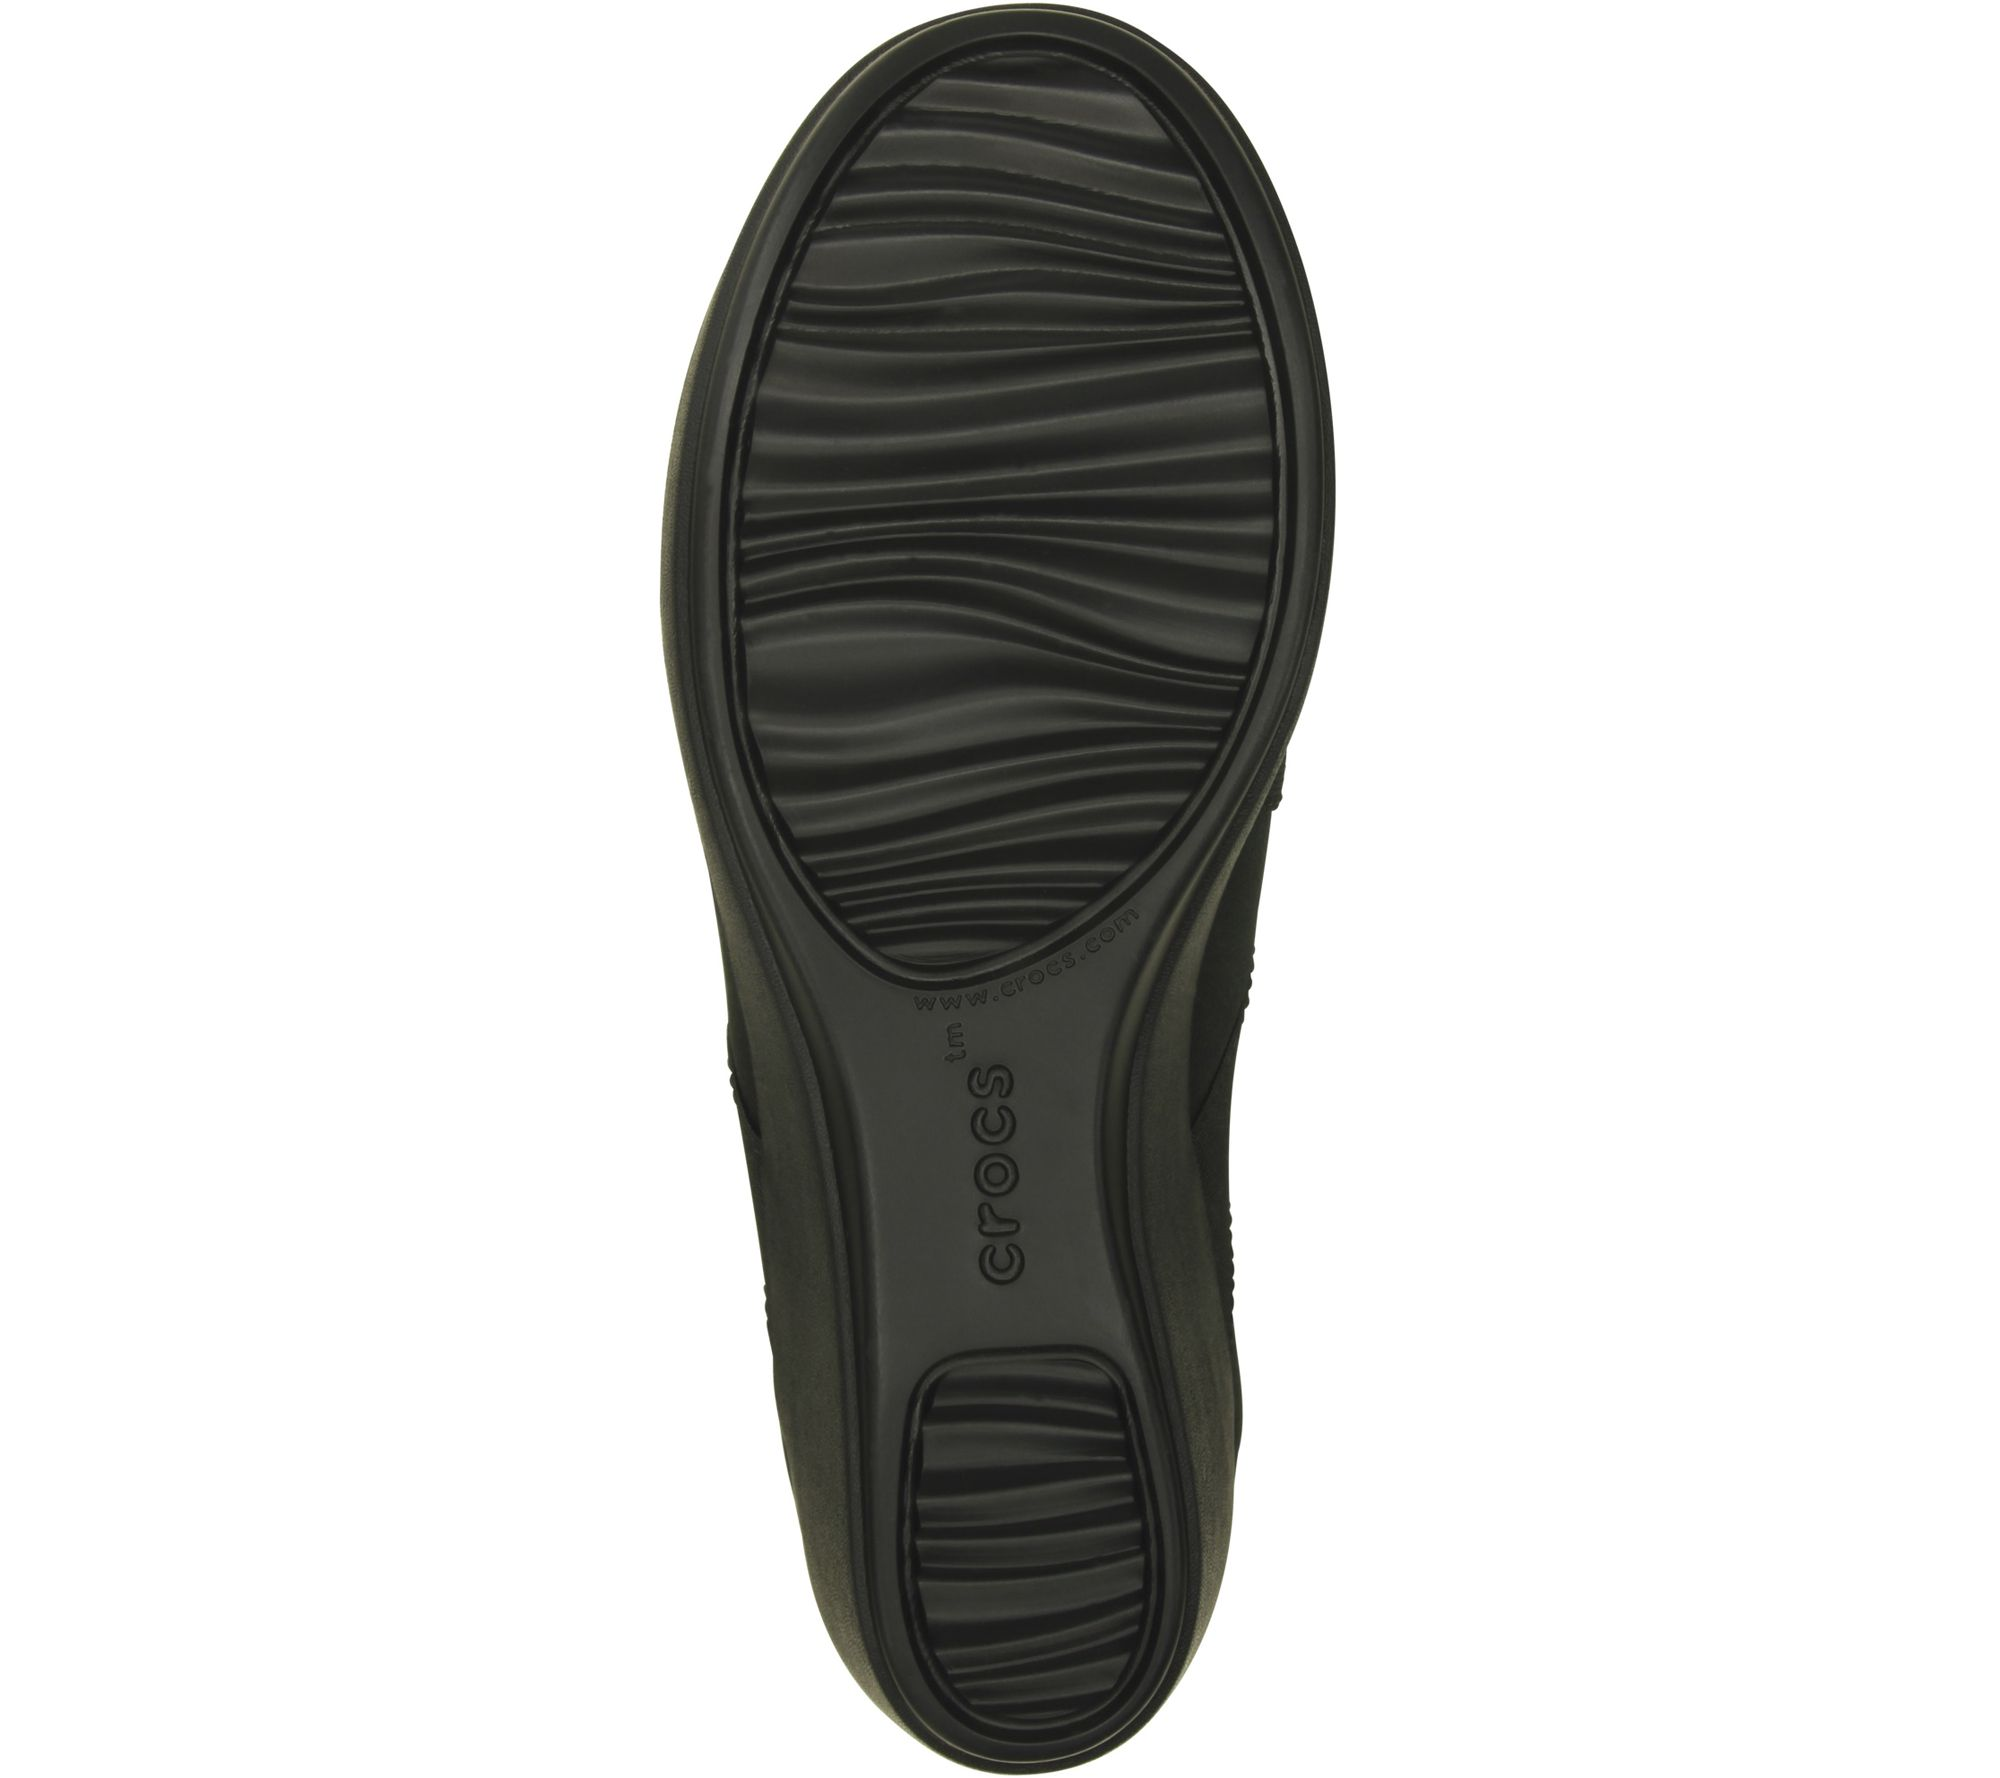 ec14a5a42f07 Crocs Wedge Slip Ons - Busy Day Stretch Asym - Page 1 — QVC.com